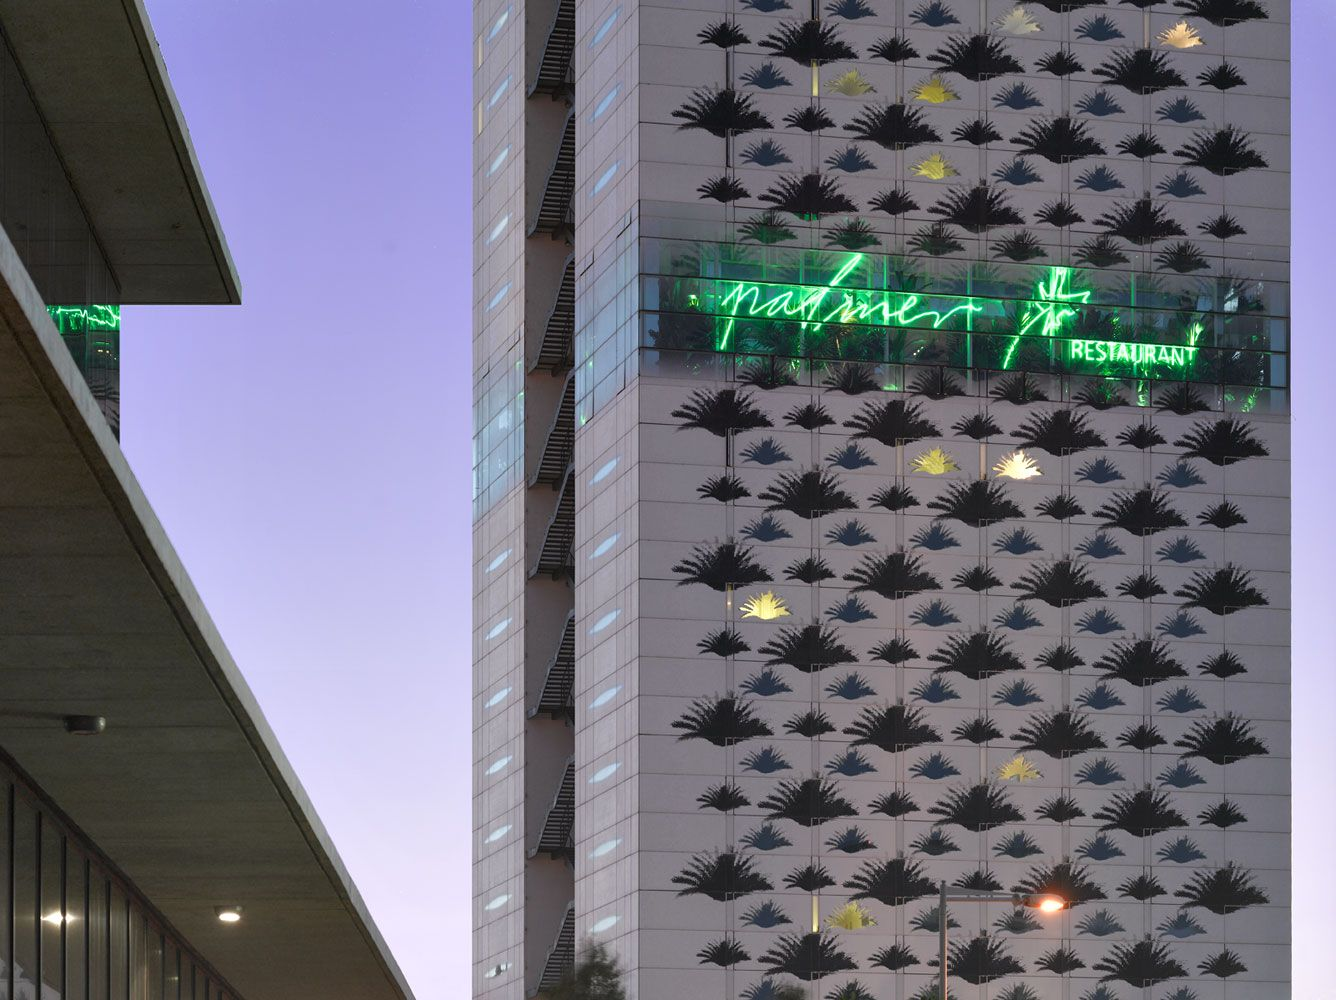 Barcelona  Marriot Renaissance Fira Hotel by Jean Nouvel + Ribas & Ribas